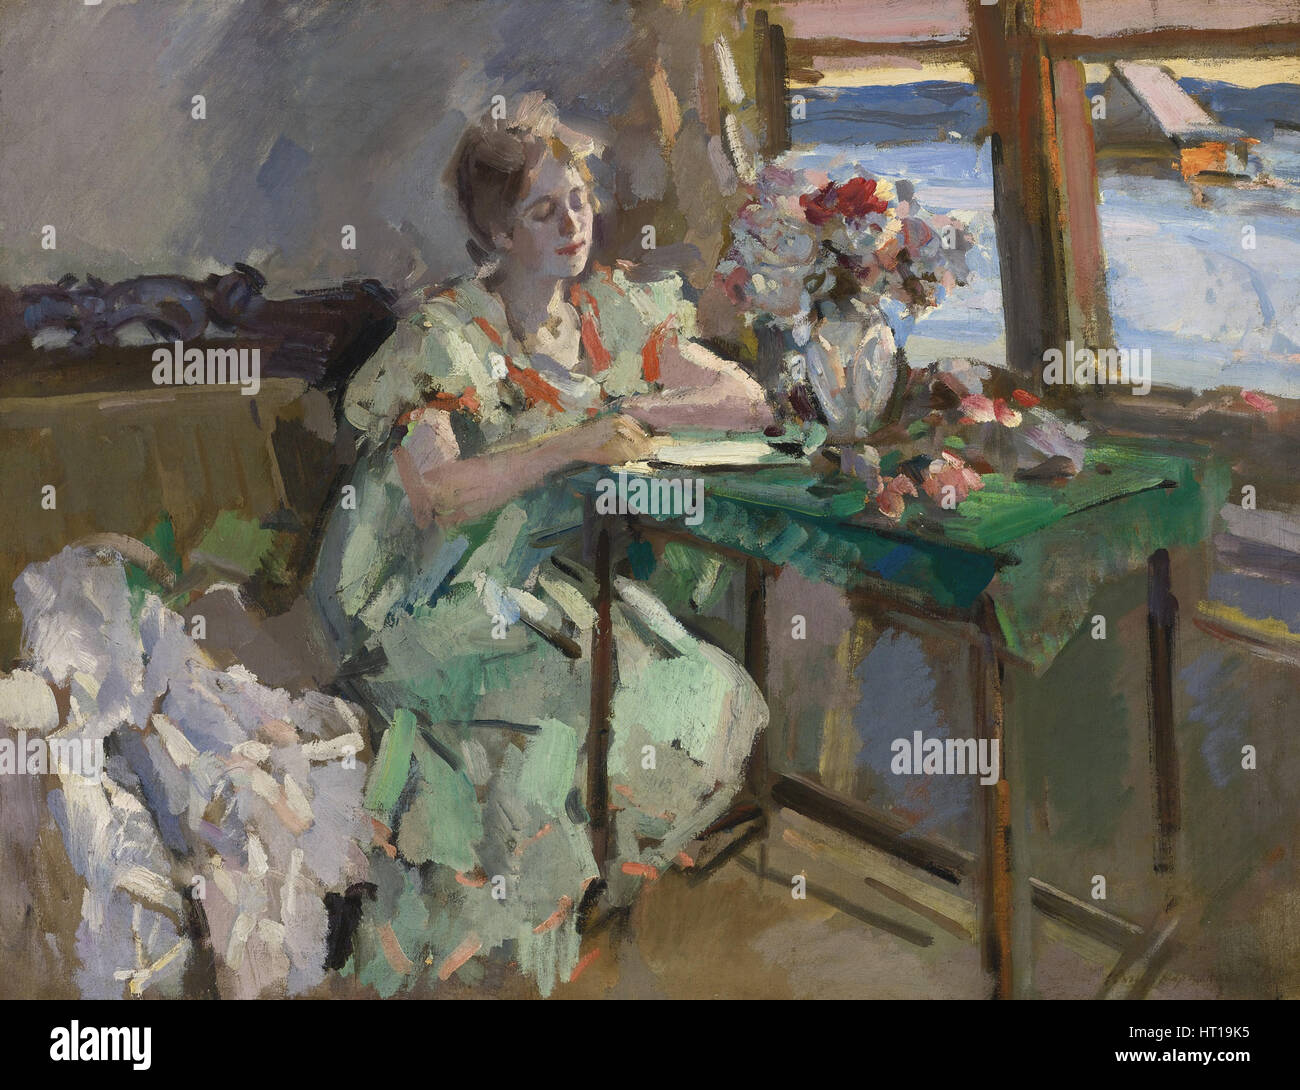 At the Window, 1918. Artist: Korovin, Konstantin Alexeyevich (1861-1939) - Stock Image